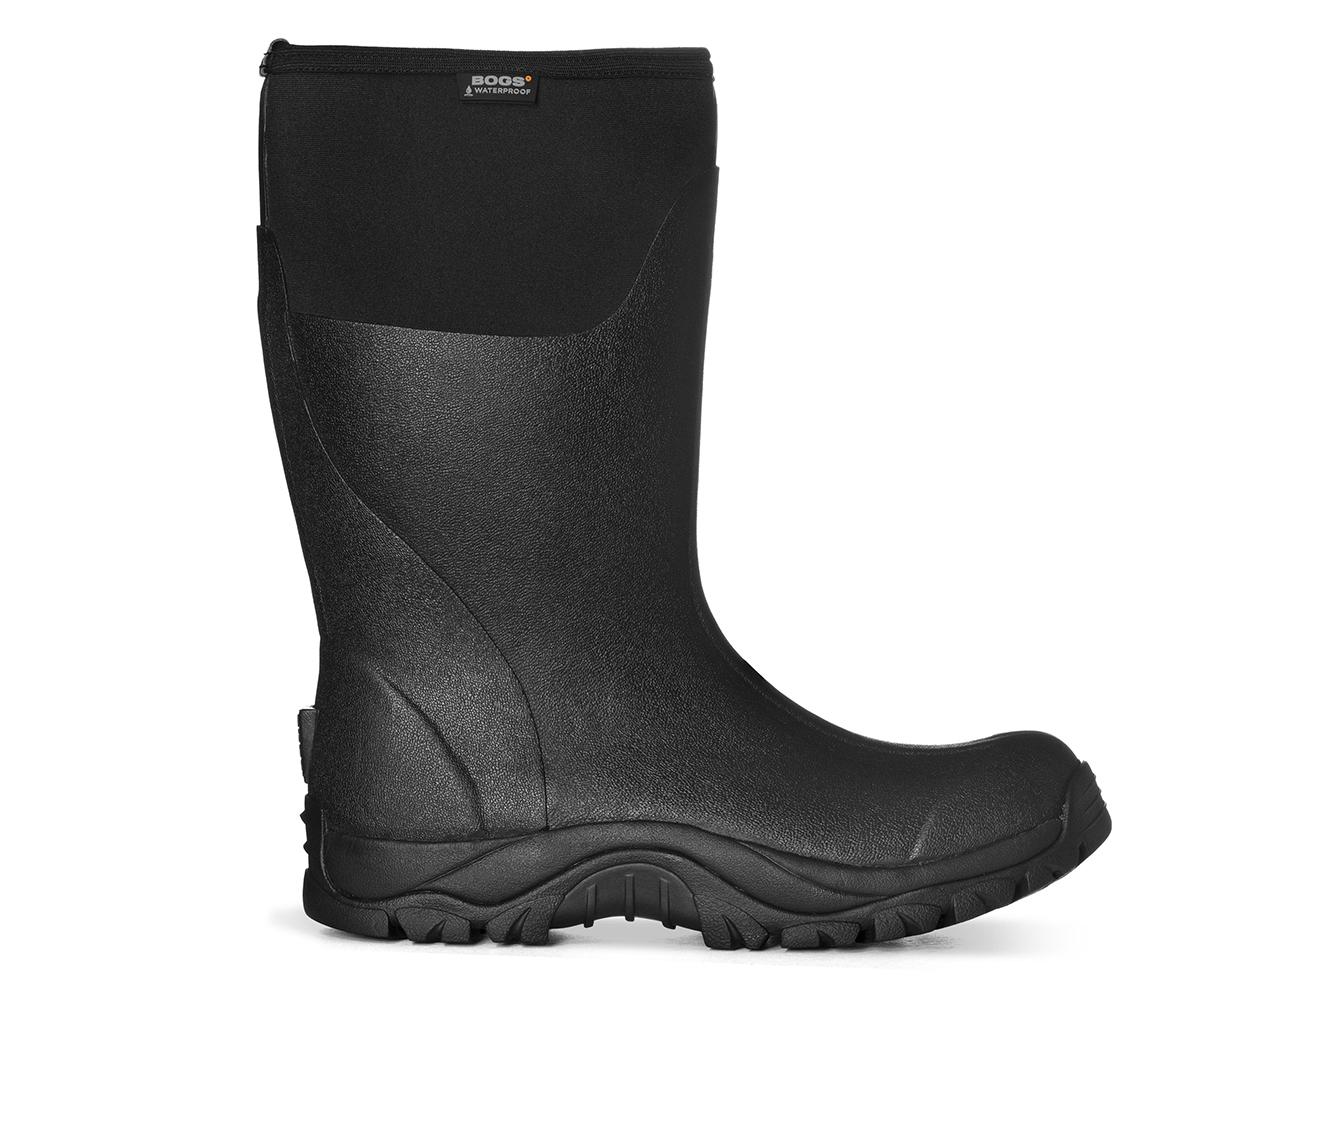 Bogs Footwear Foreman Men's Boots (Black Fabric)